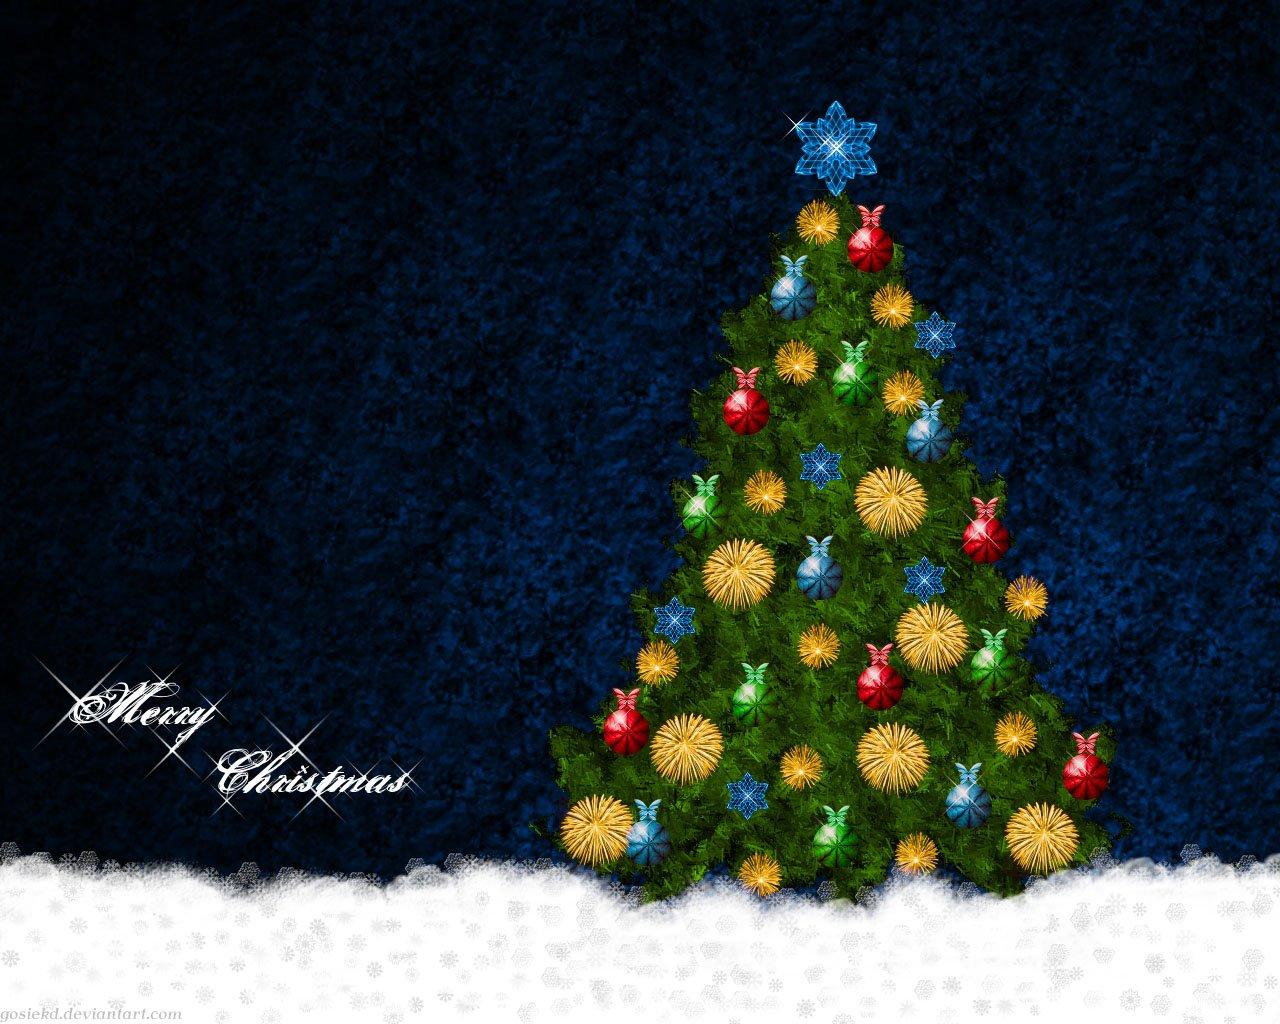 40 Free Christmas Wallpapers HD Quality